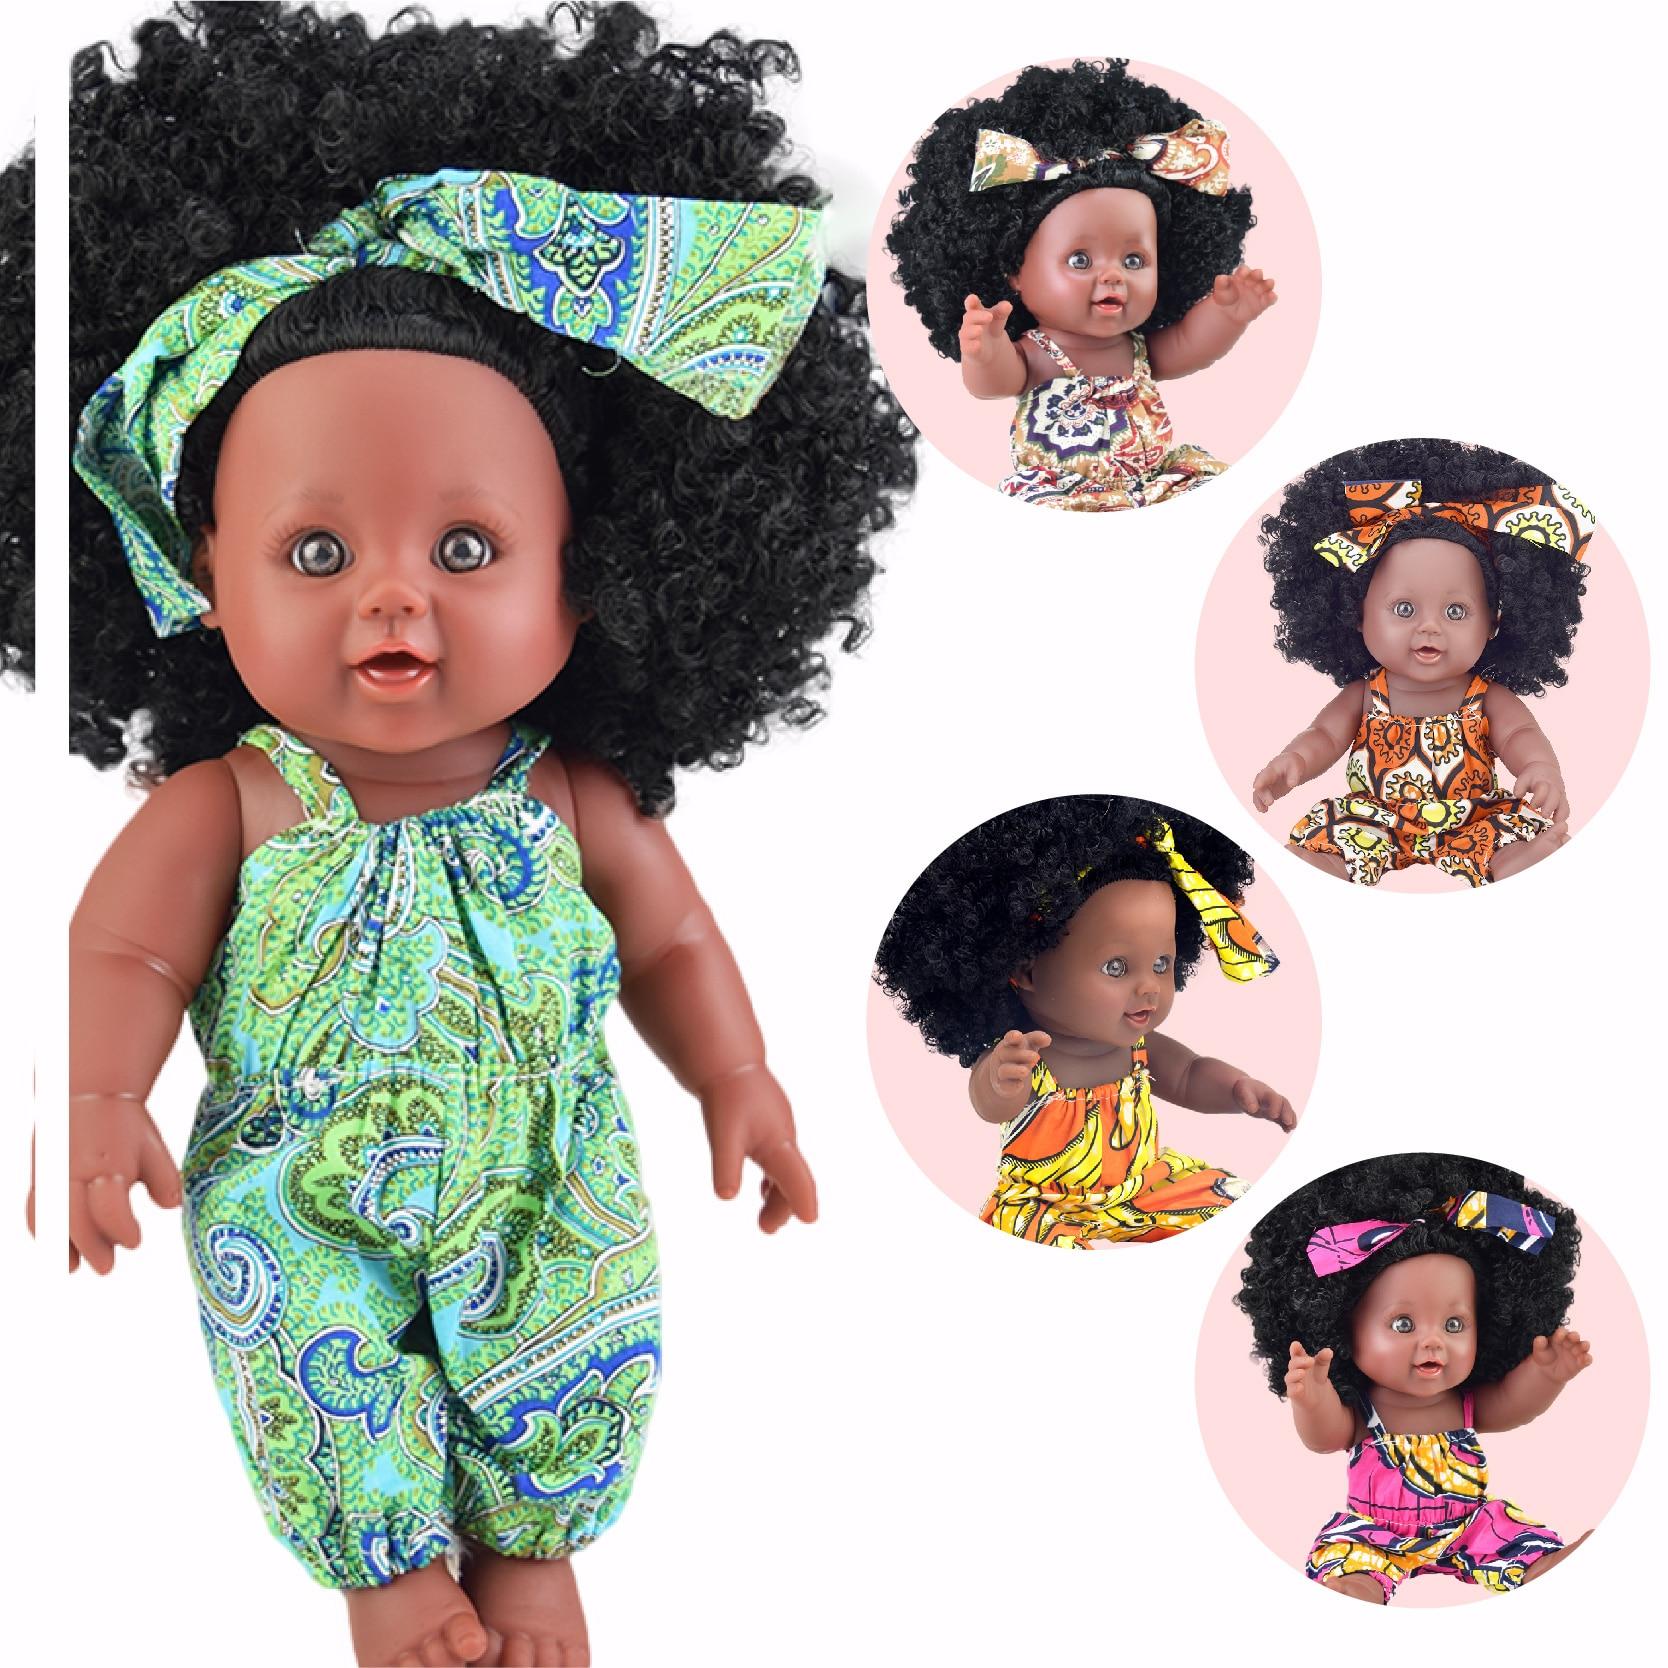 ¡Bebé negro muñecas pop Africana verde! 12 pulgadas lol muñecas de vinilo de silicona 30 cm recién nacido poupee boneca bebé de peluche chica, chico damas